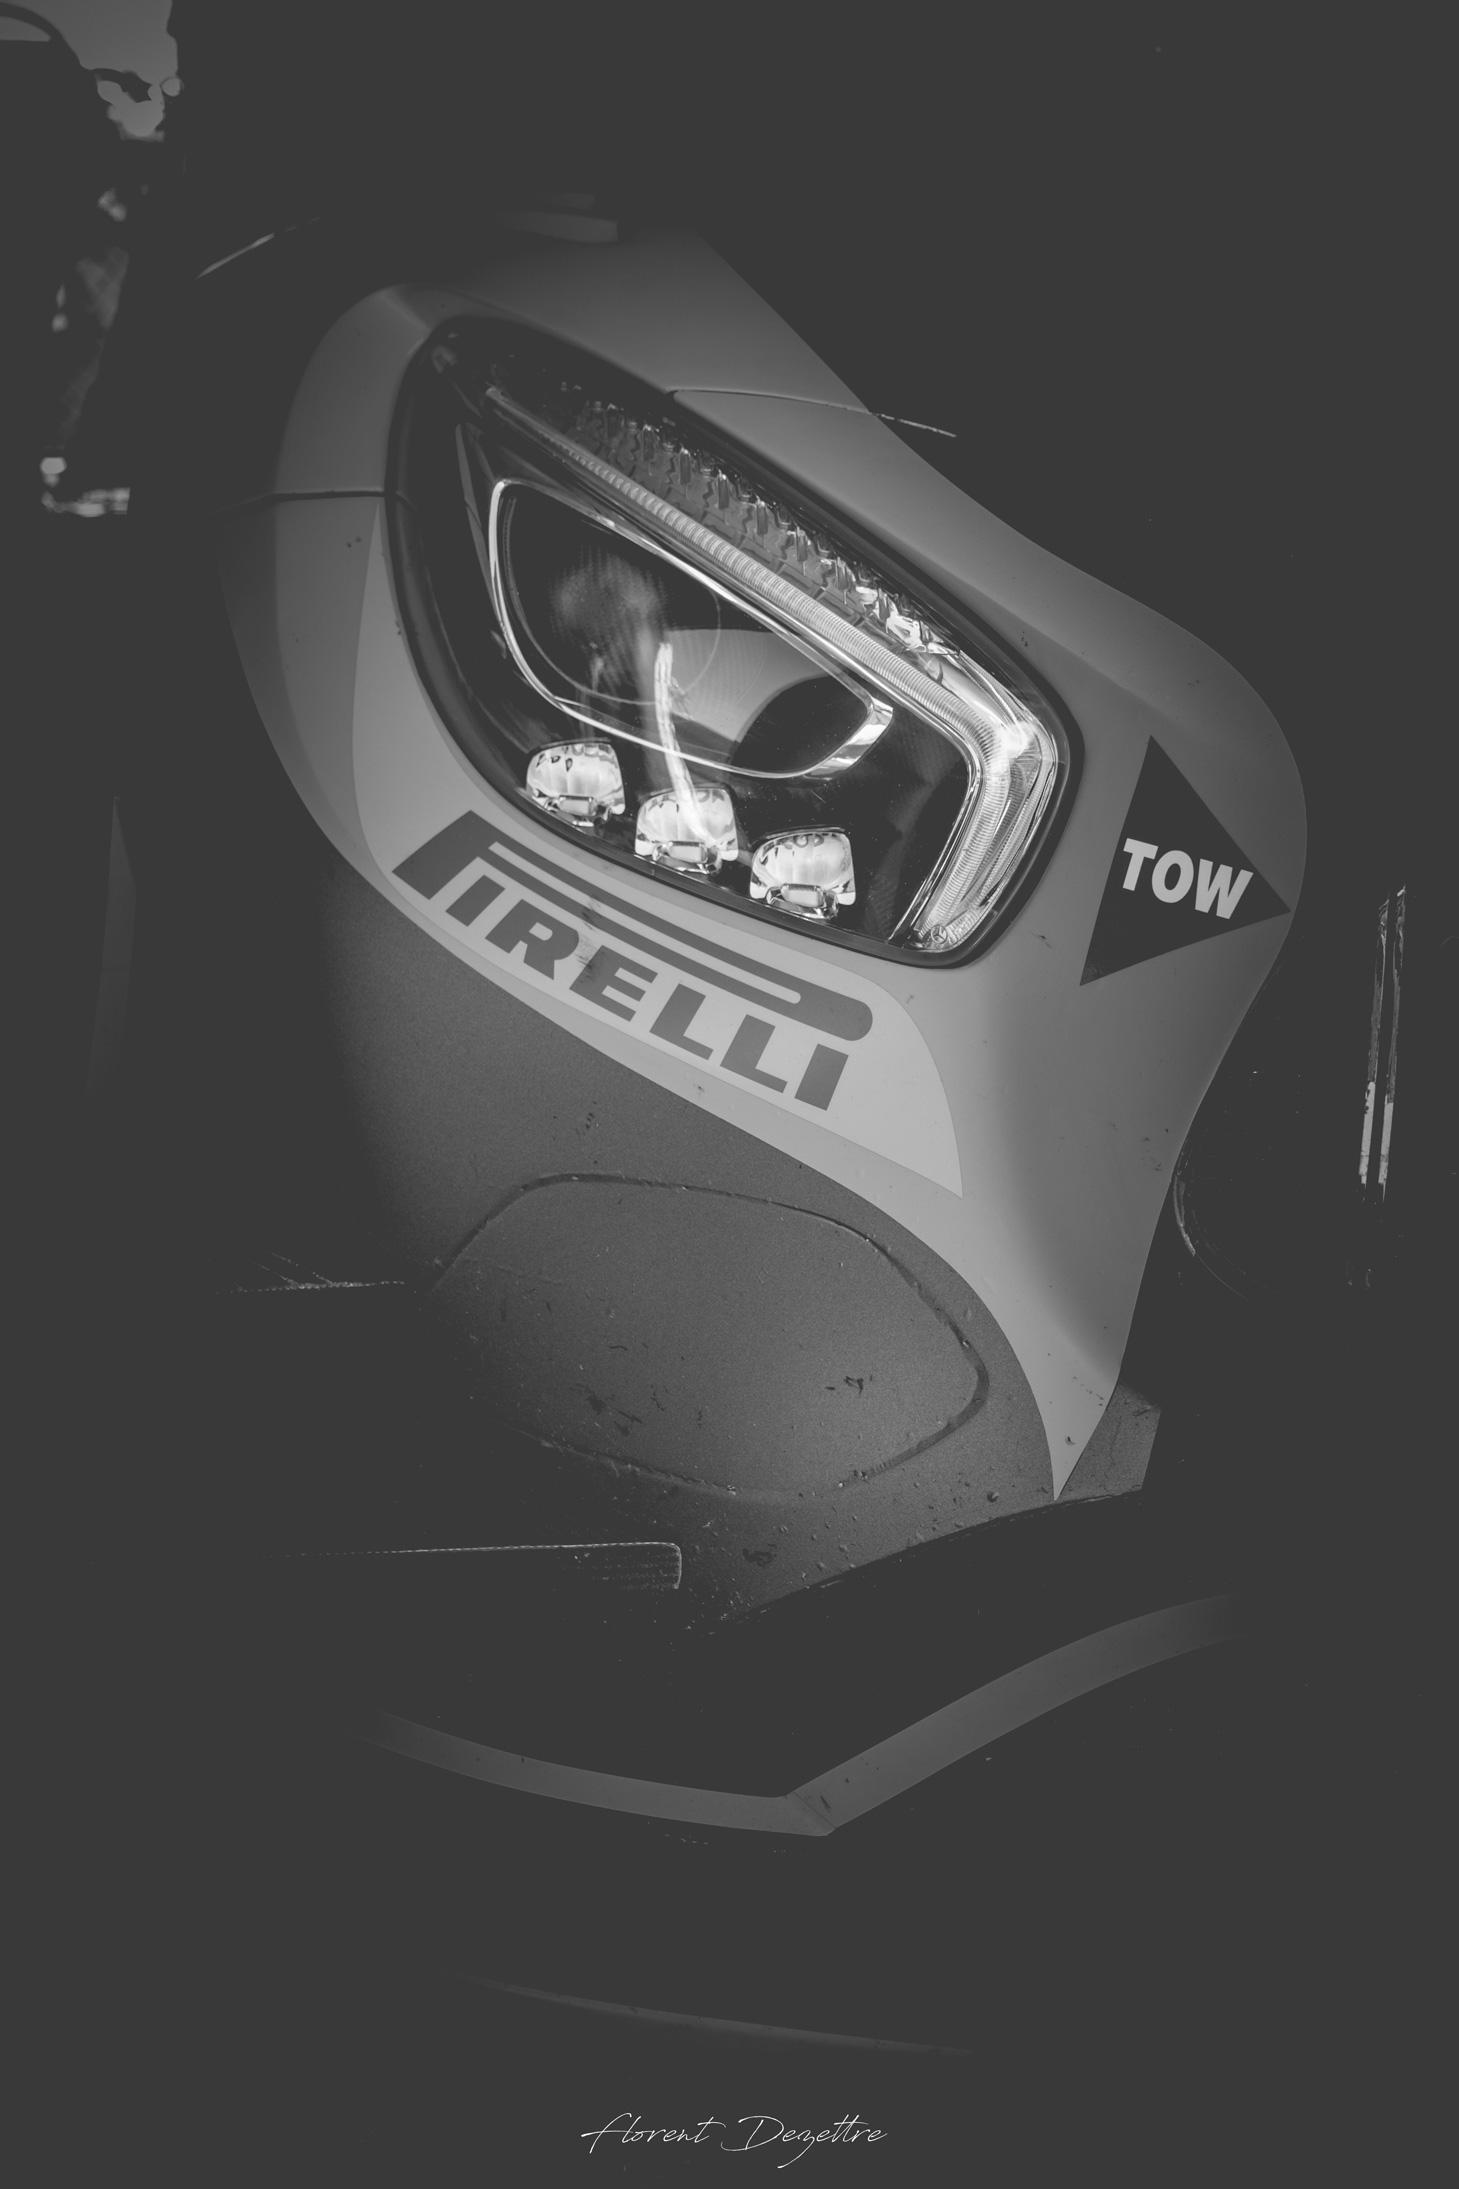 MOTOR_0762